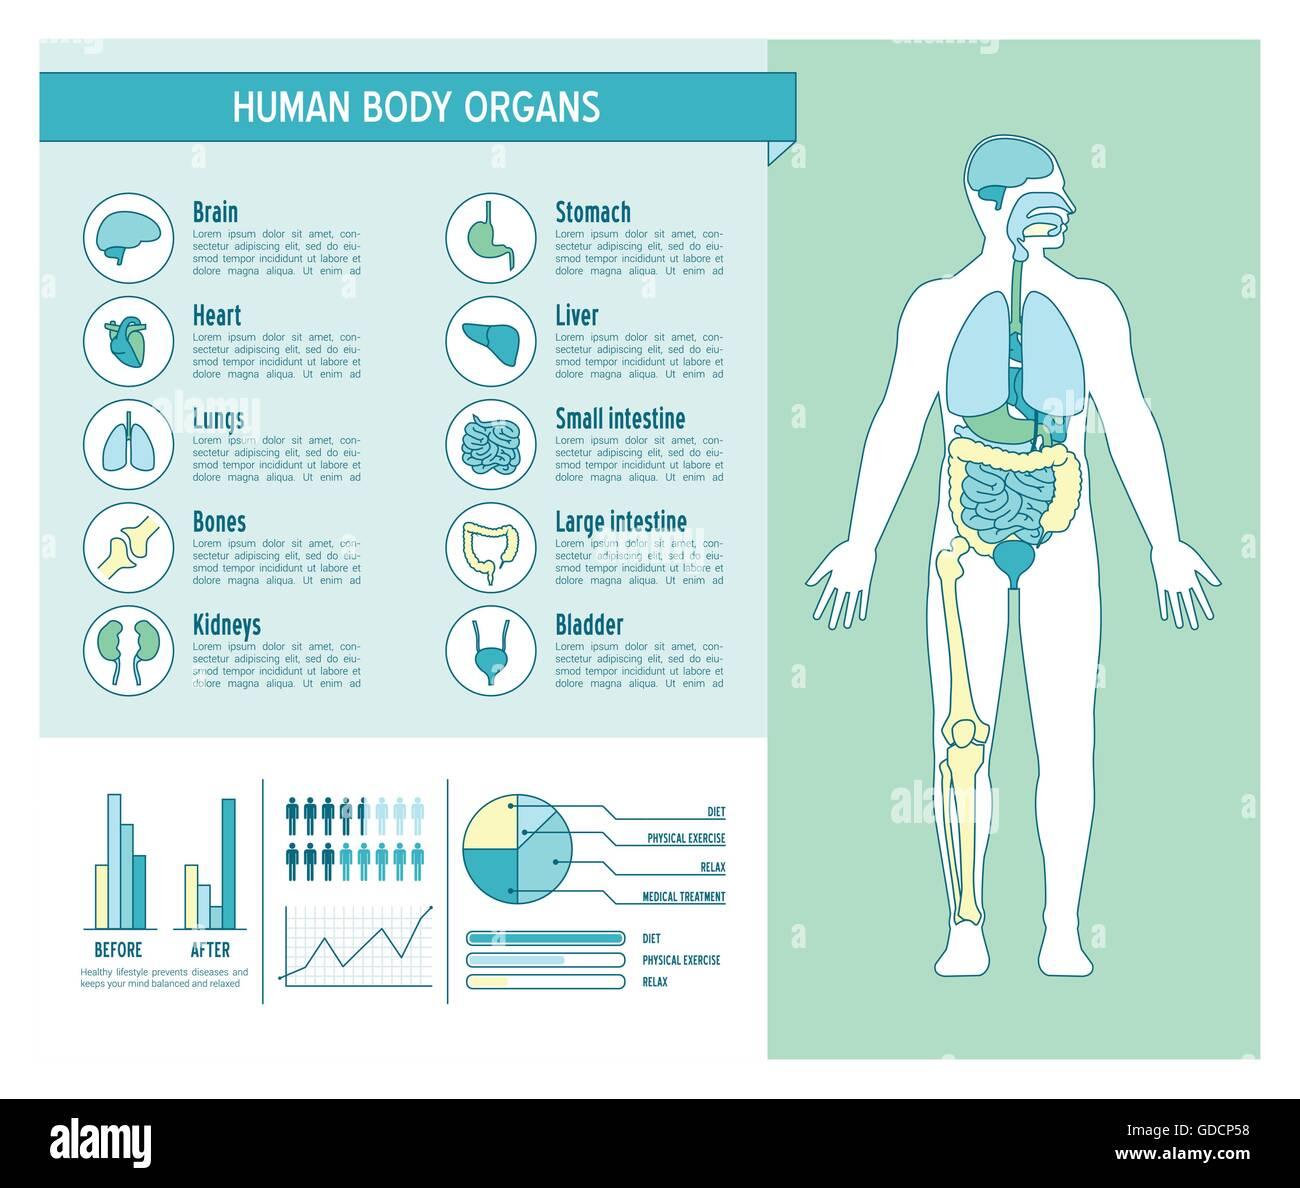 Berühmt Medizinische Diagramm Des Menschlichen Körpers Fotos ...